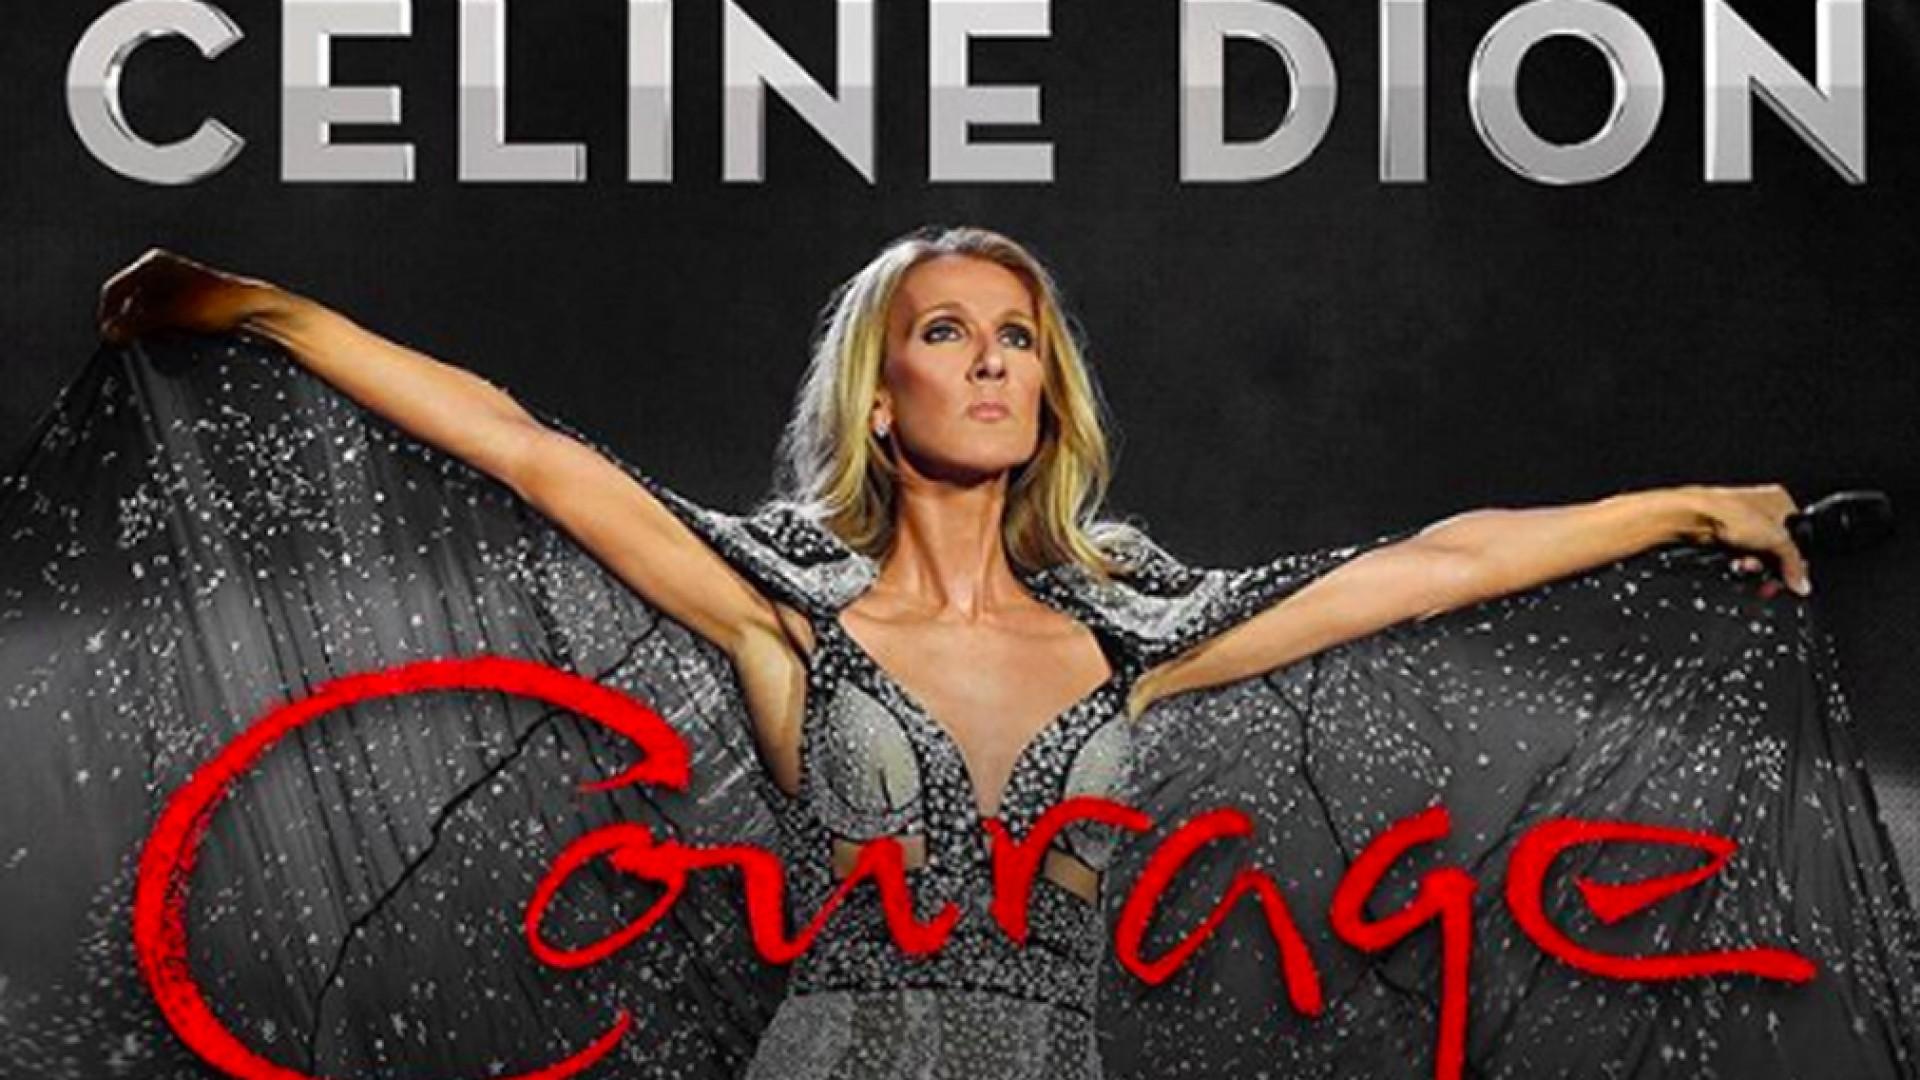 Celine Dion amână sine die turneul european